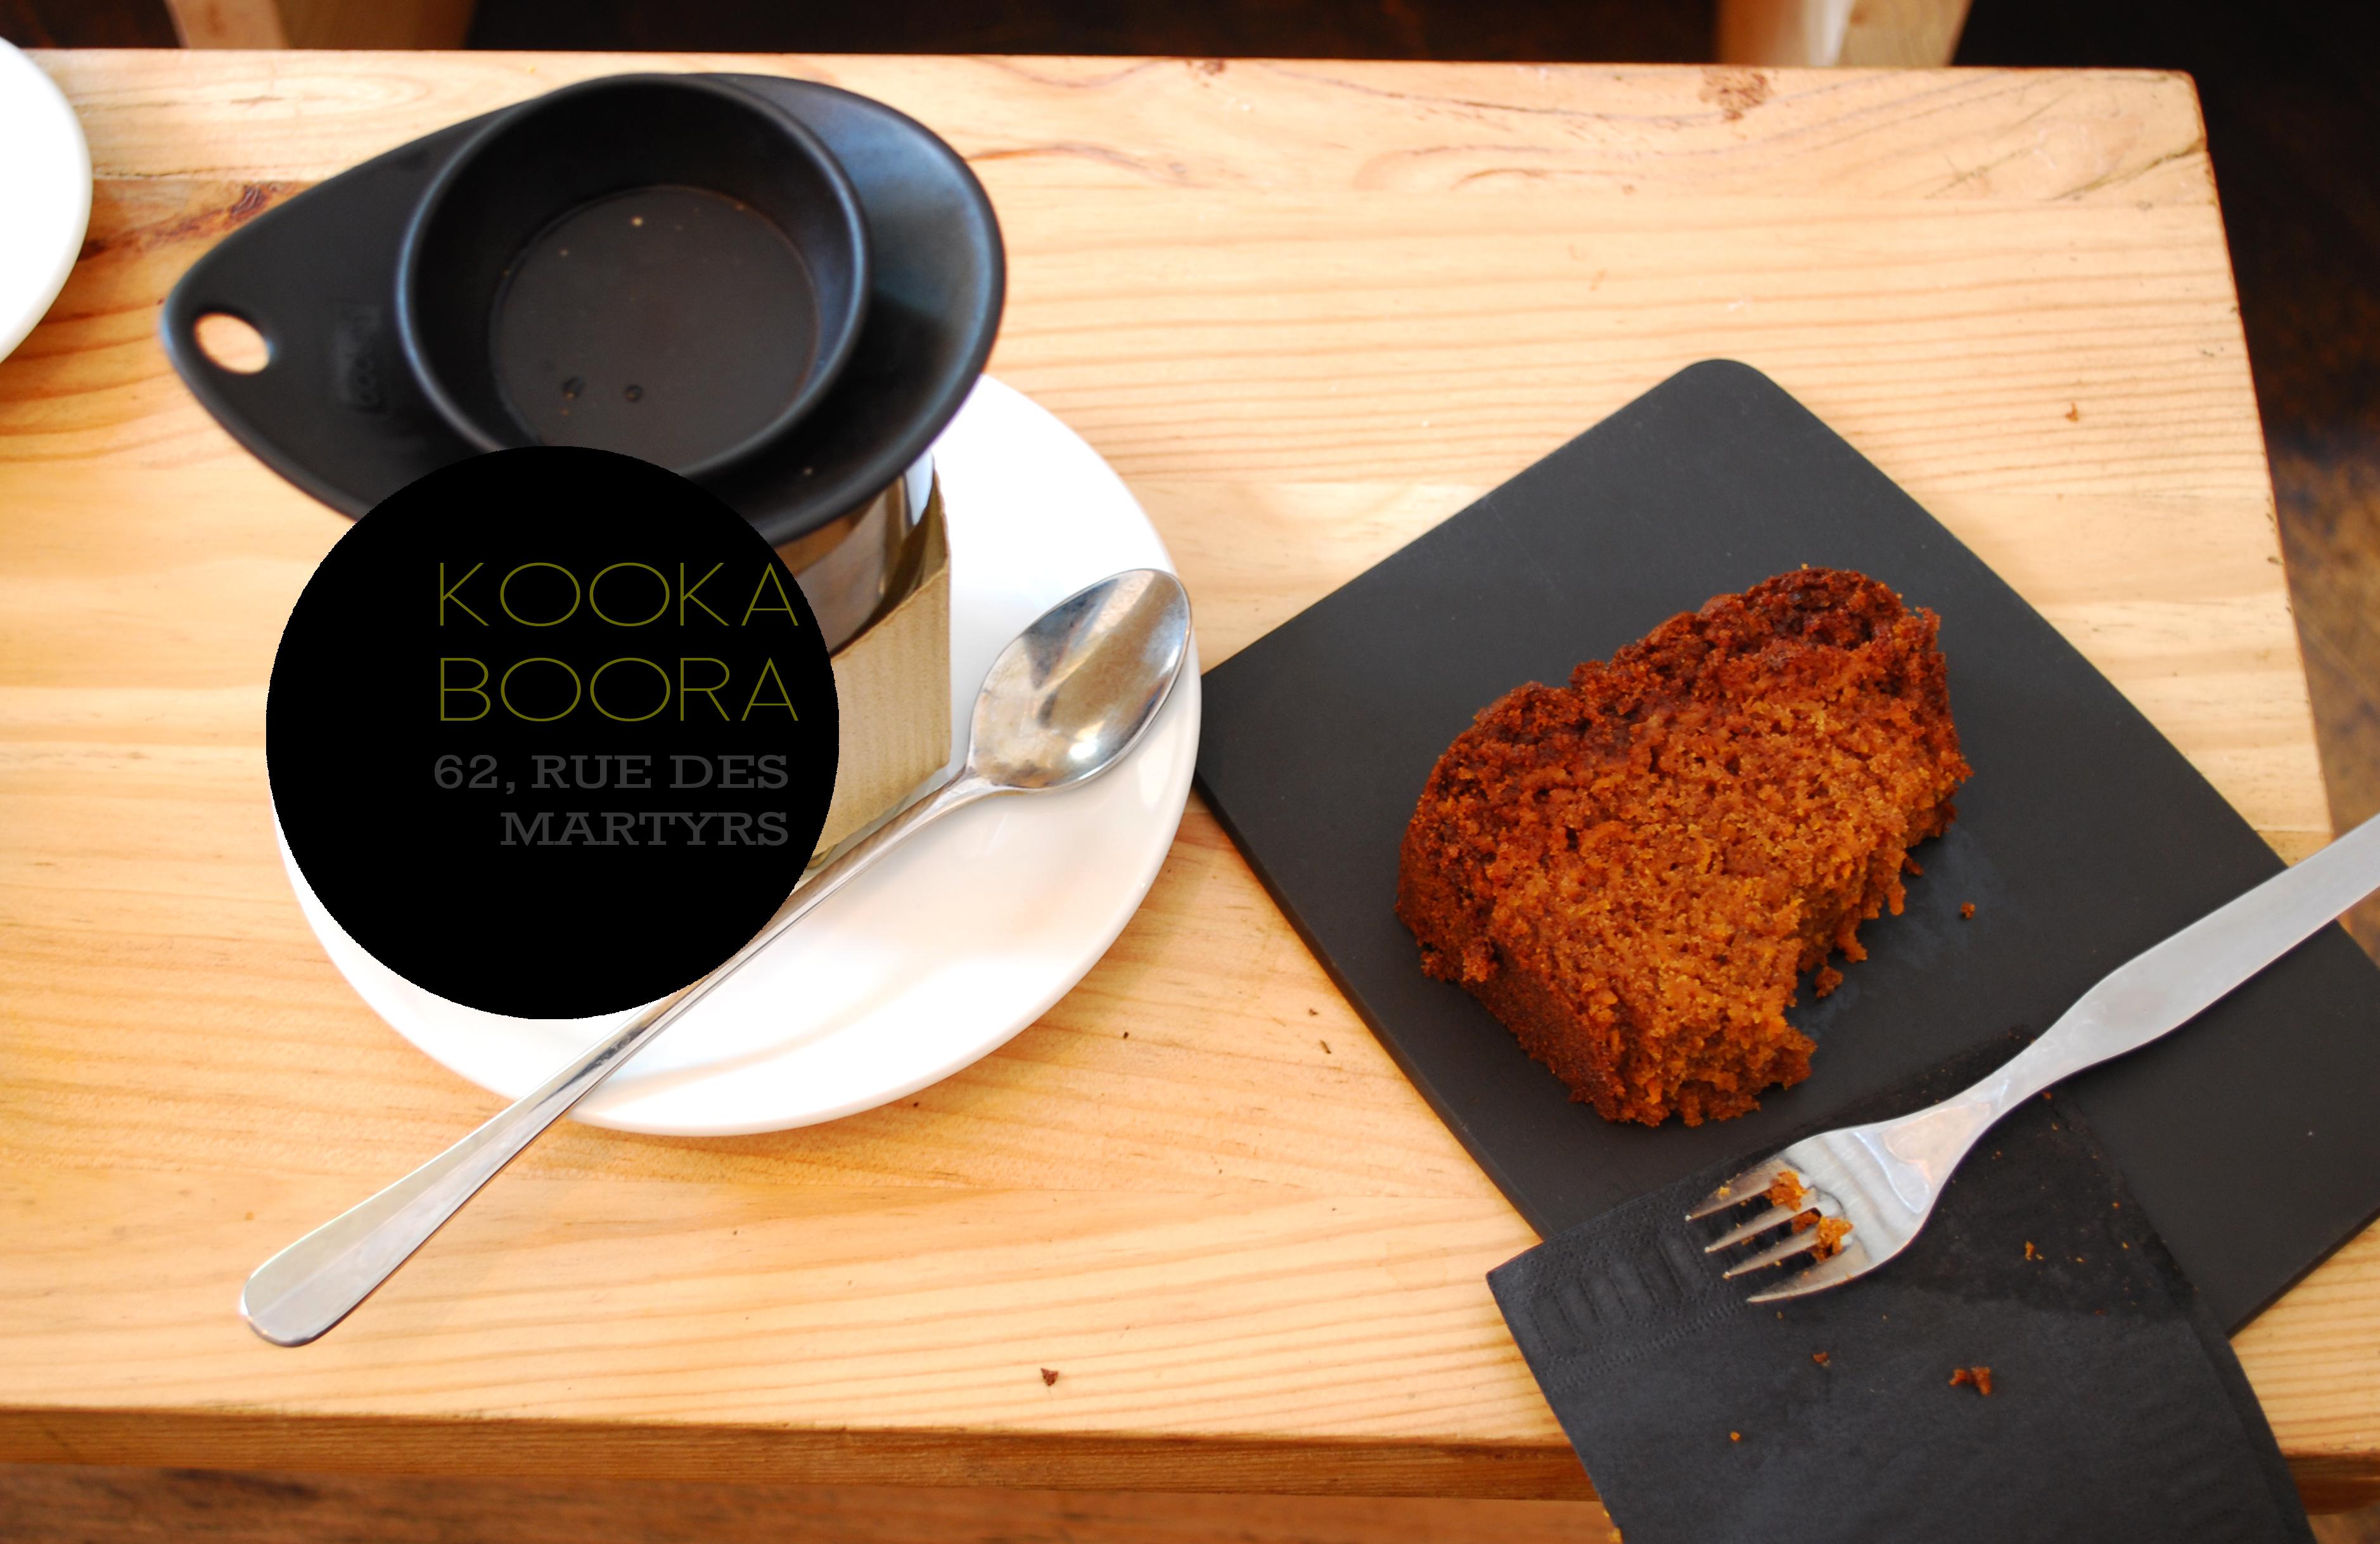 Kooka Boora-coffeeshop-by-le-polyedre_3